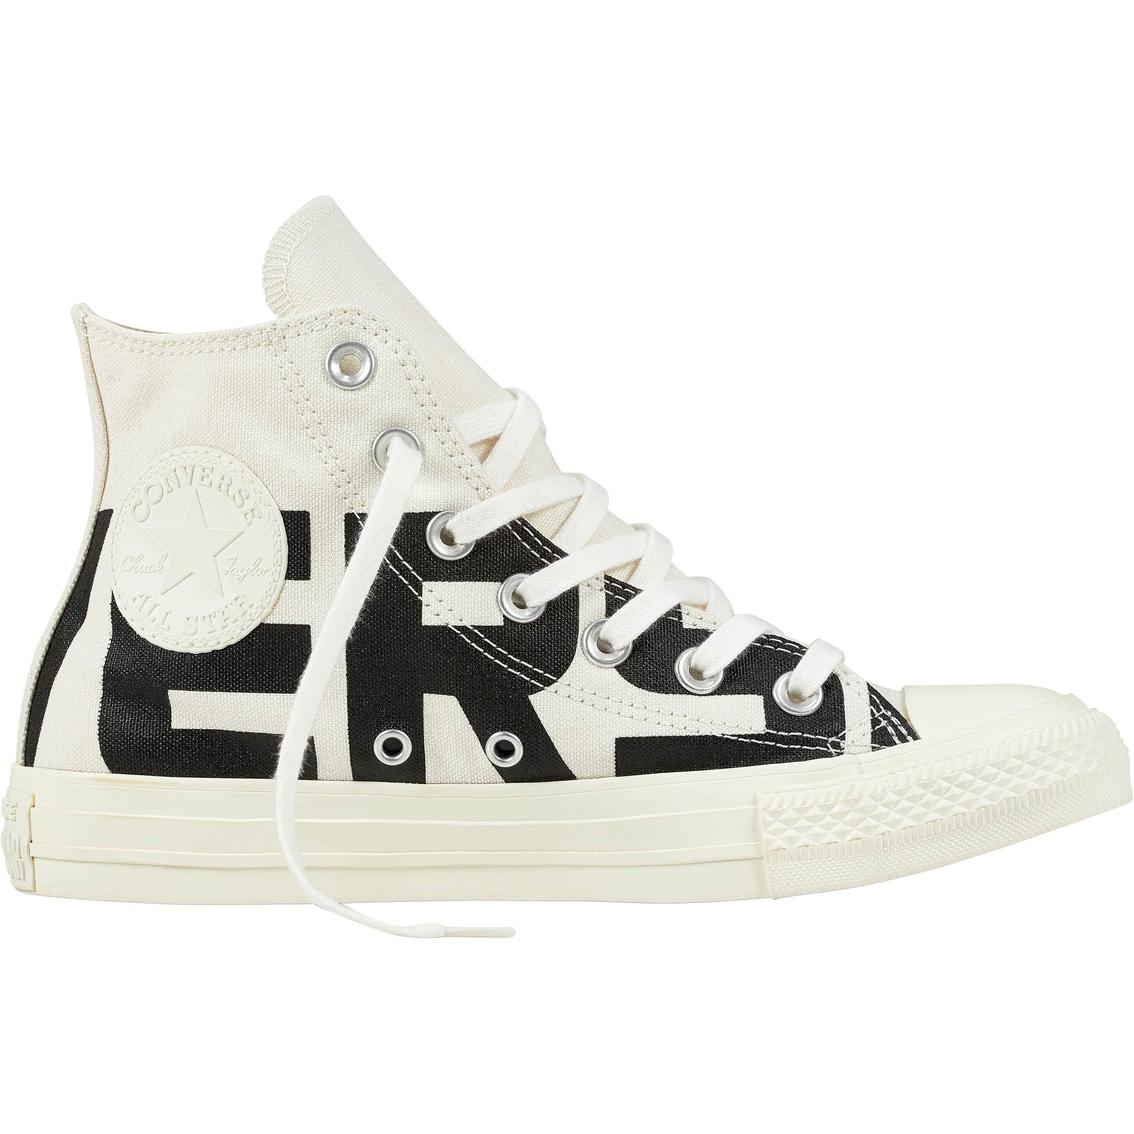 0dbd3bbc427f Converse Chuck Taylor All Star Men s Hi Wordmark Athletic Shoes ...